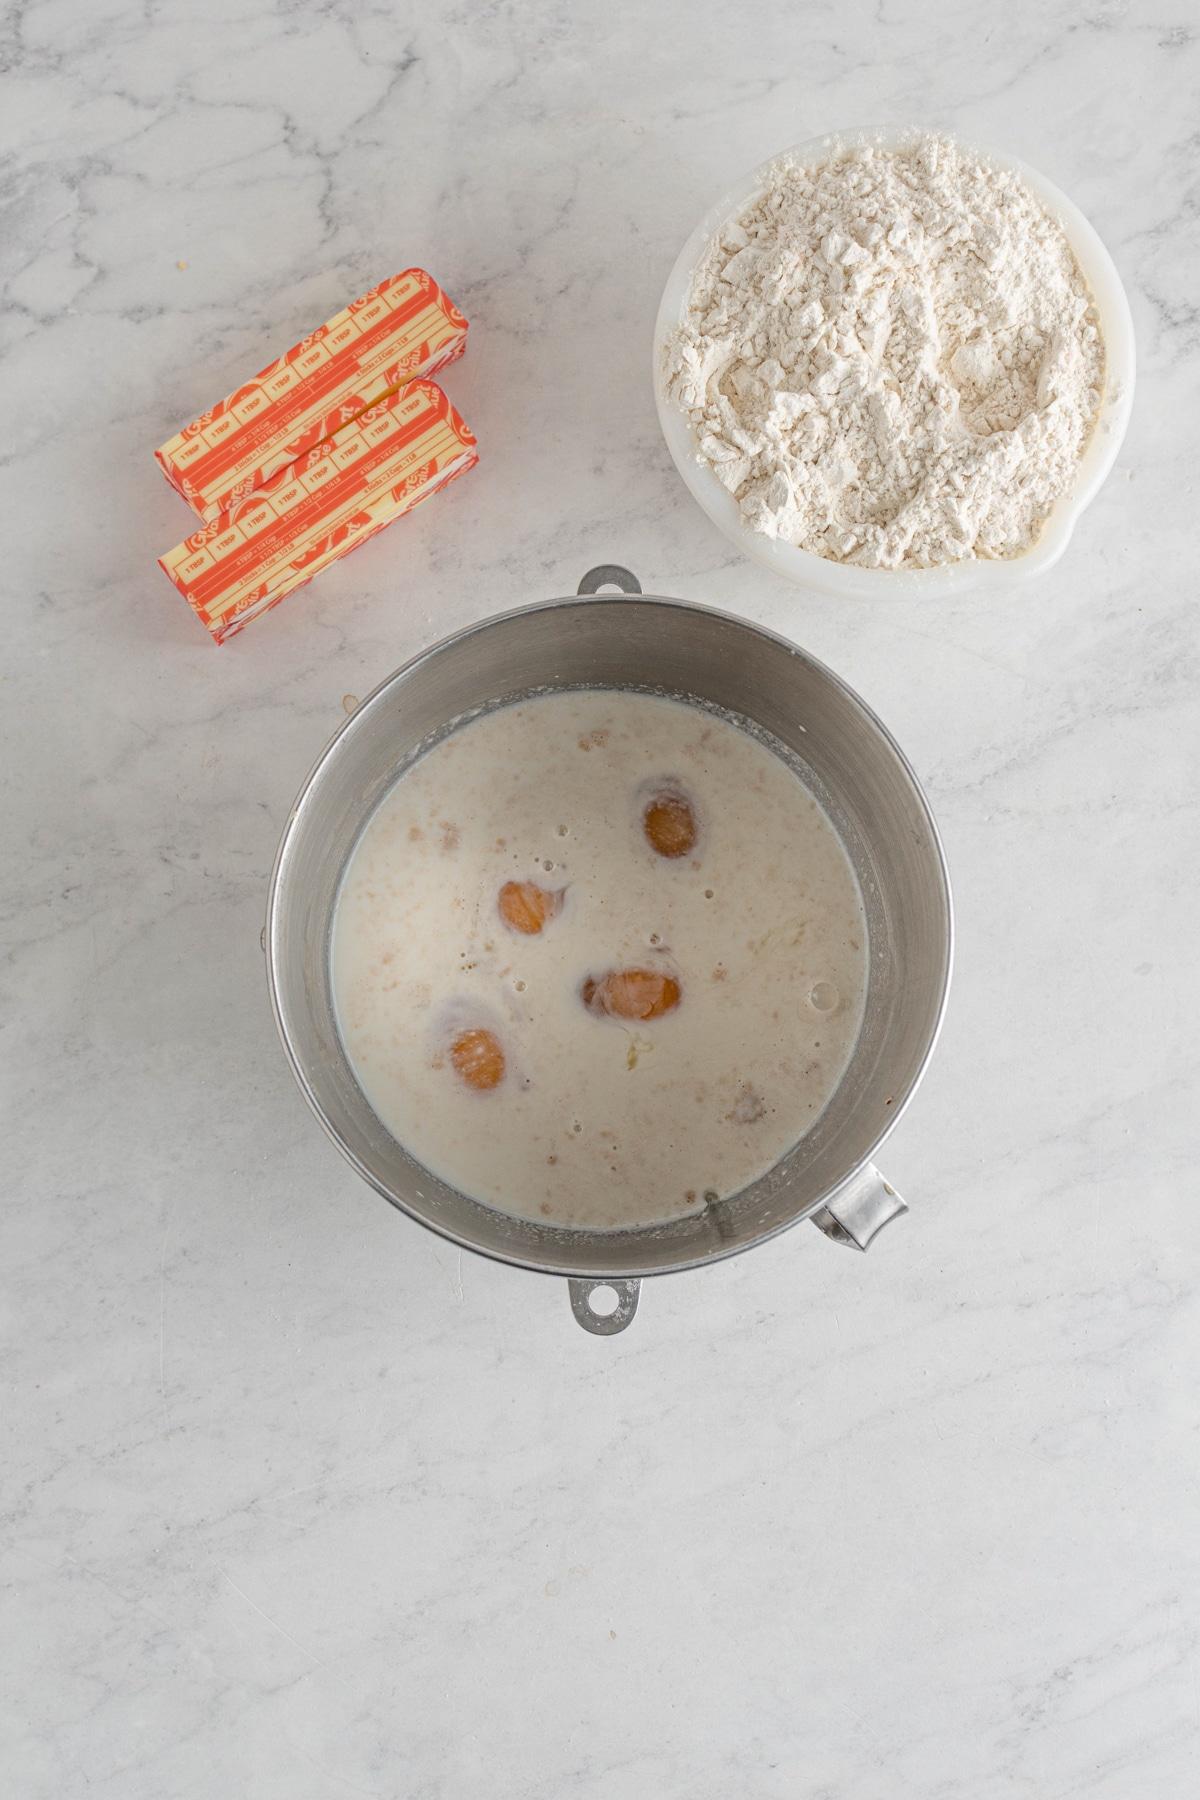 milk warmed in a metal bowl